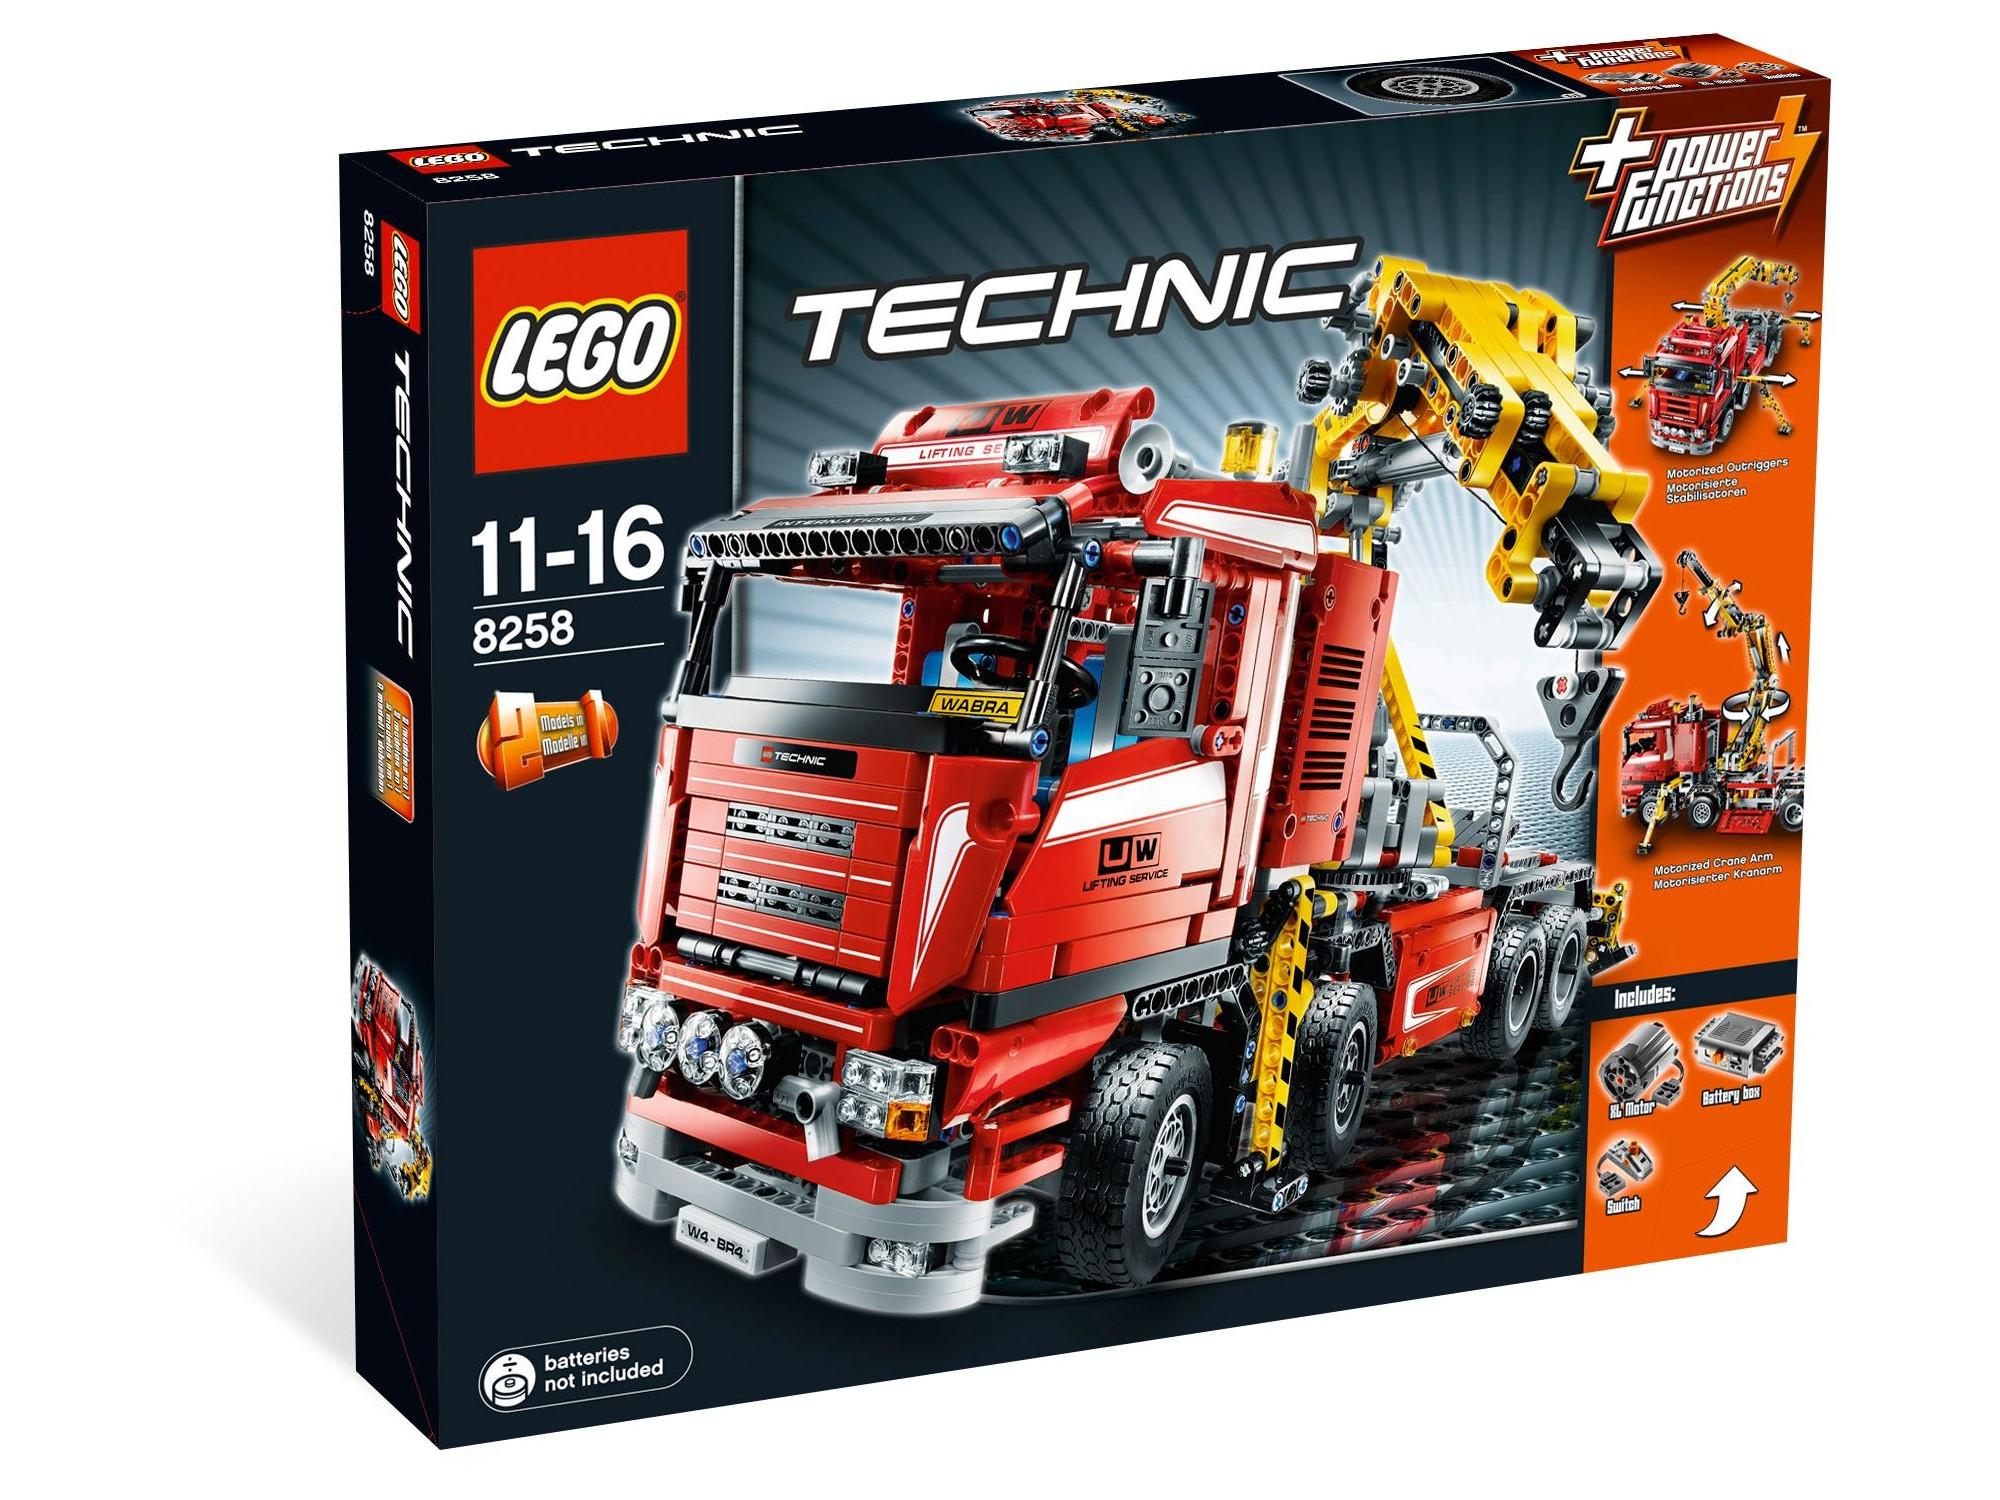 lego technic 8258 truck mit power schwenkkran. Black Bedroom Furniture Sets. Home Design Ideas